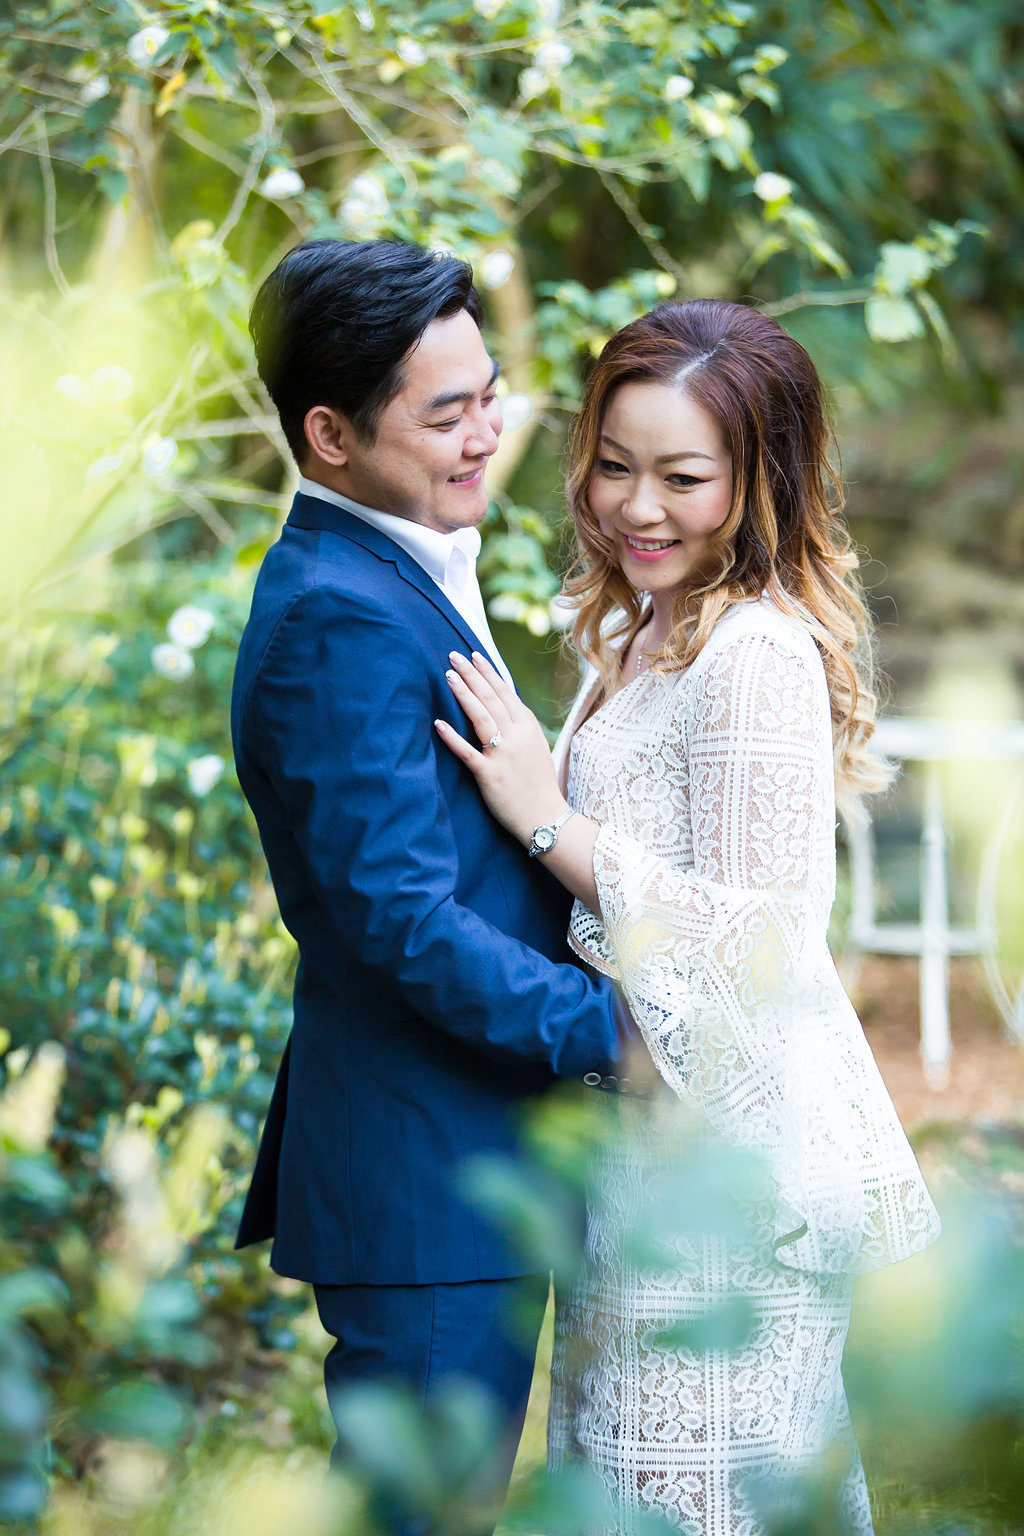 Sydney Wedding Photographer - Lavender Bay - Jennifer Lam Photography (6).jpg